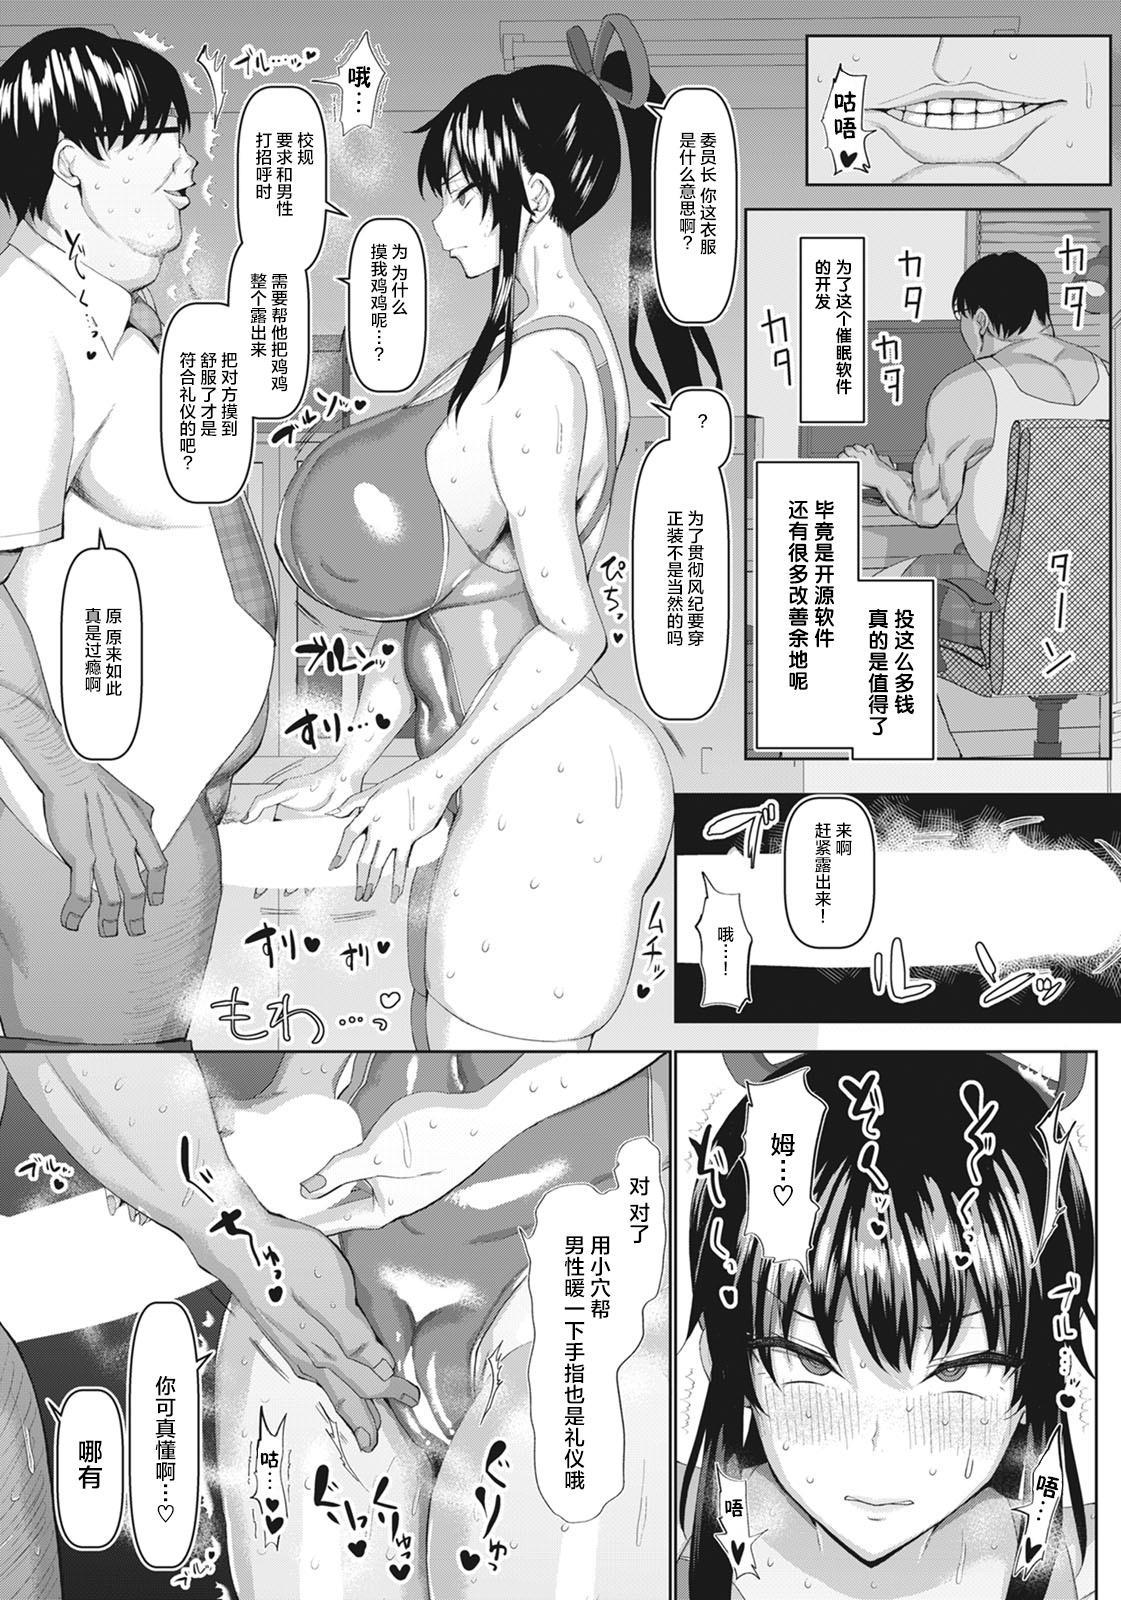 [chin] Fuuki no Midare ni Sennou ga Kikutte Hontou?   I Can Brainwash A Girl Into Violating Public Morals!? (ANGEL Club 2020-11)[Chinese]【不可视汉化】 9